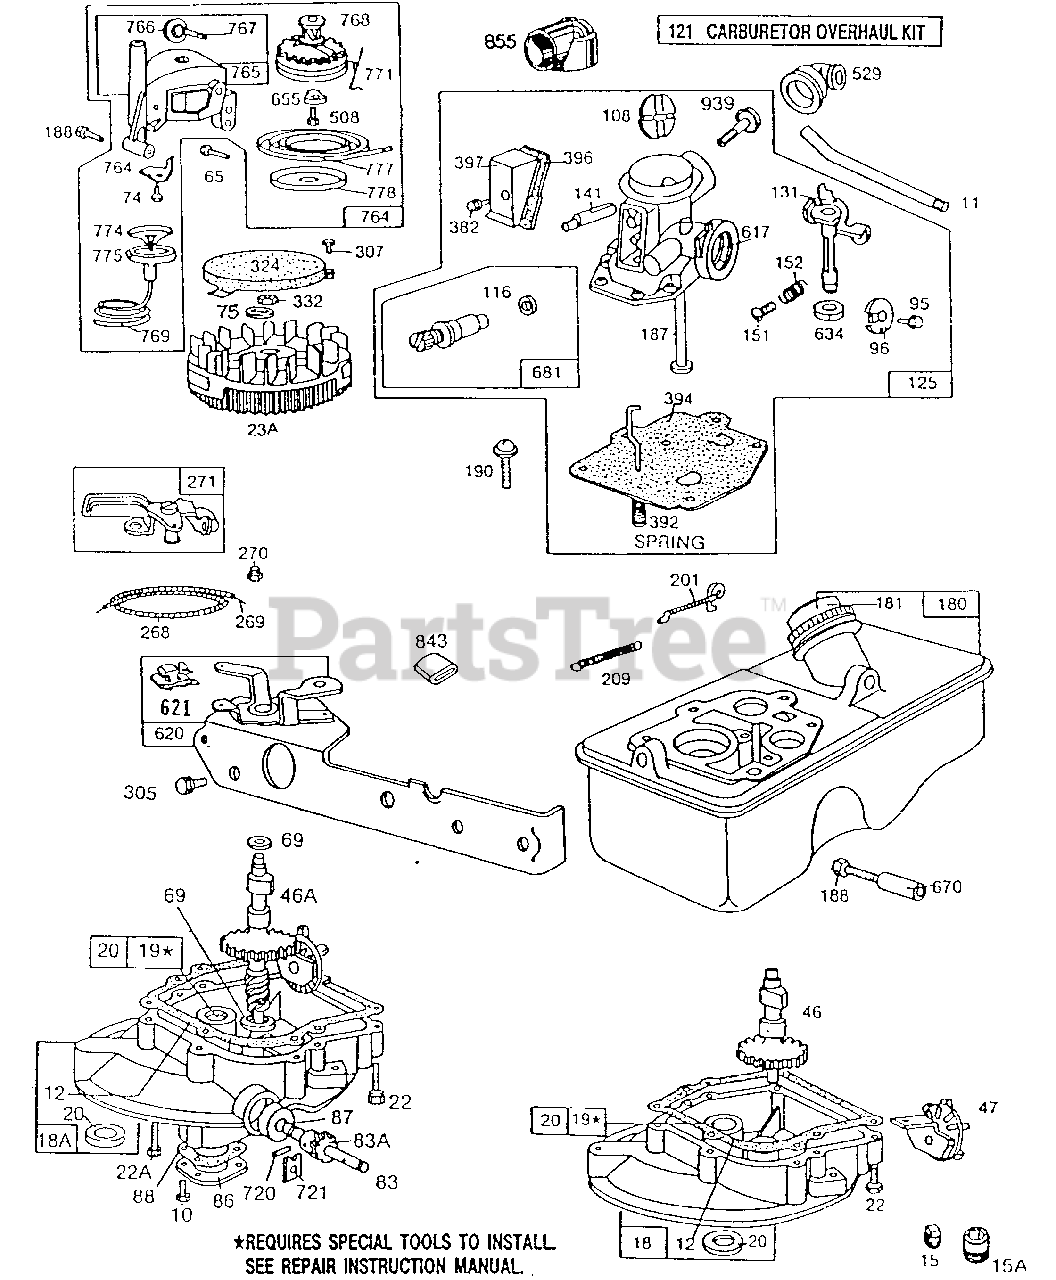 briggs & stratton 92502-3140-02 - briggs & stratton vertical engine  carb,fueltank,sumps,vertpull parts lookup with diagrams | partstree  partstree